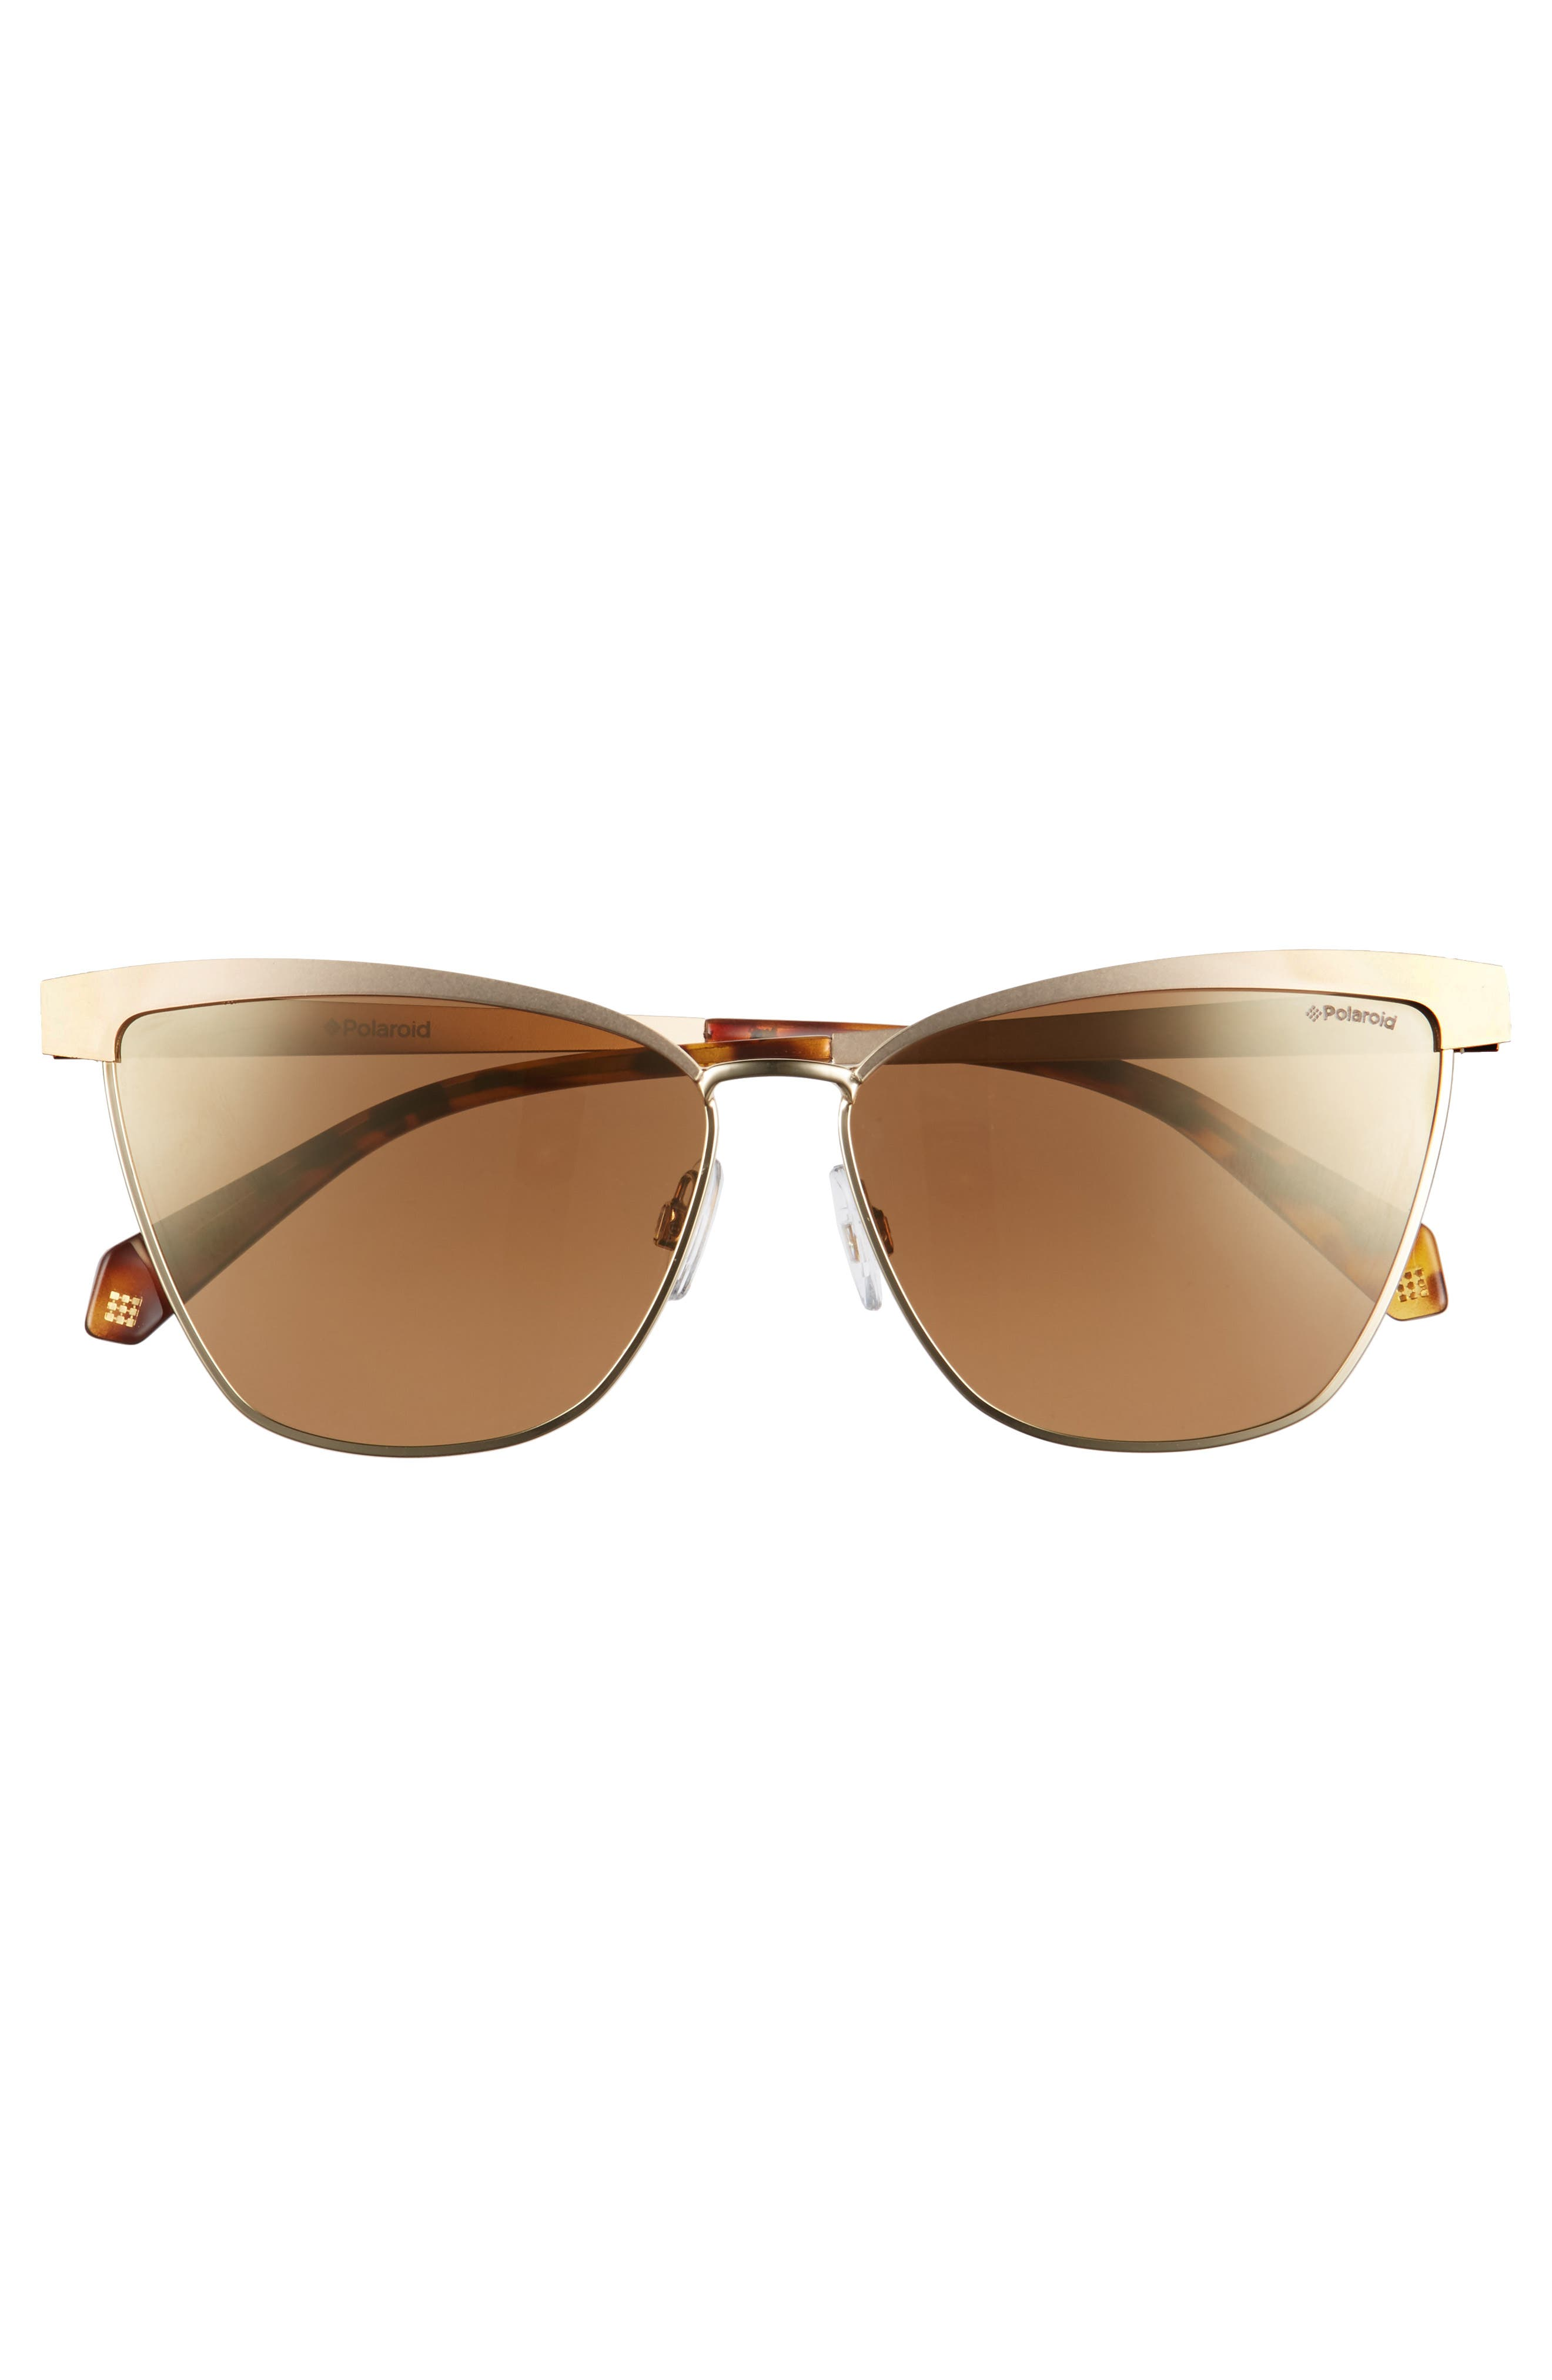 60mm Polarized Cat Eye Sunglasses,                             Alternate thumbnail 3, color,                             Gold